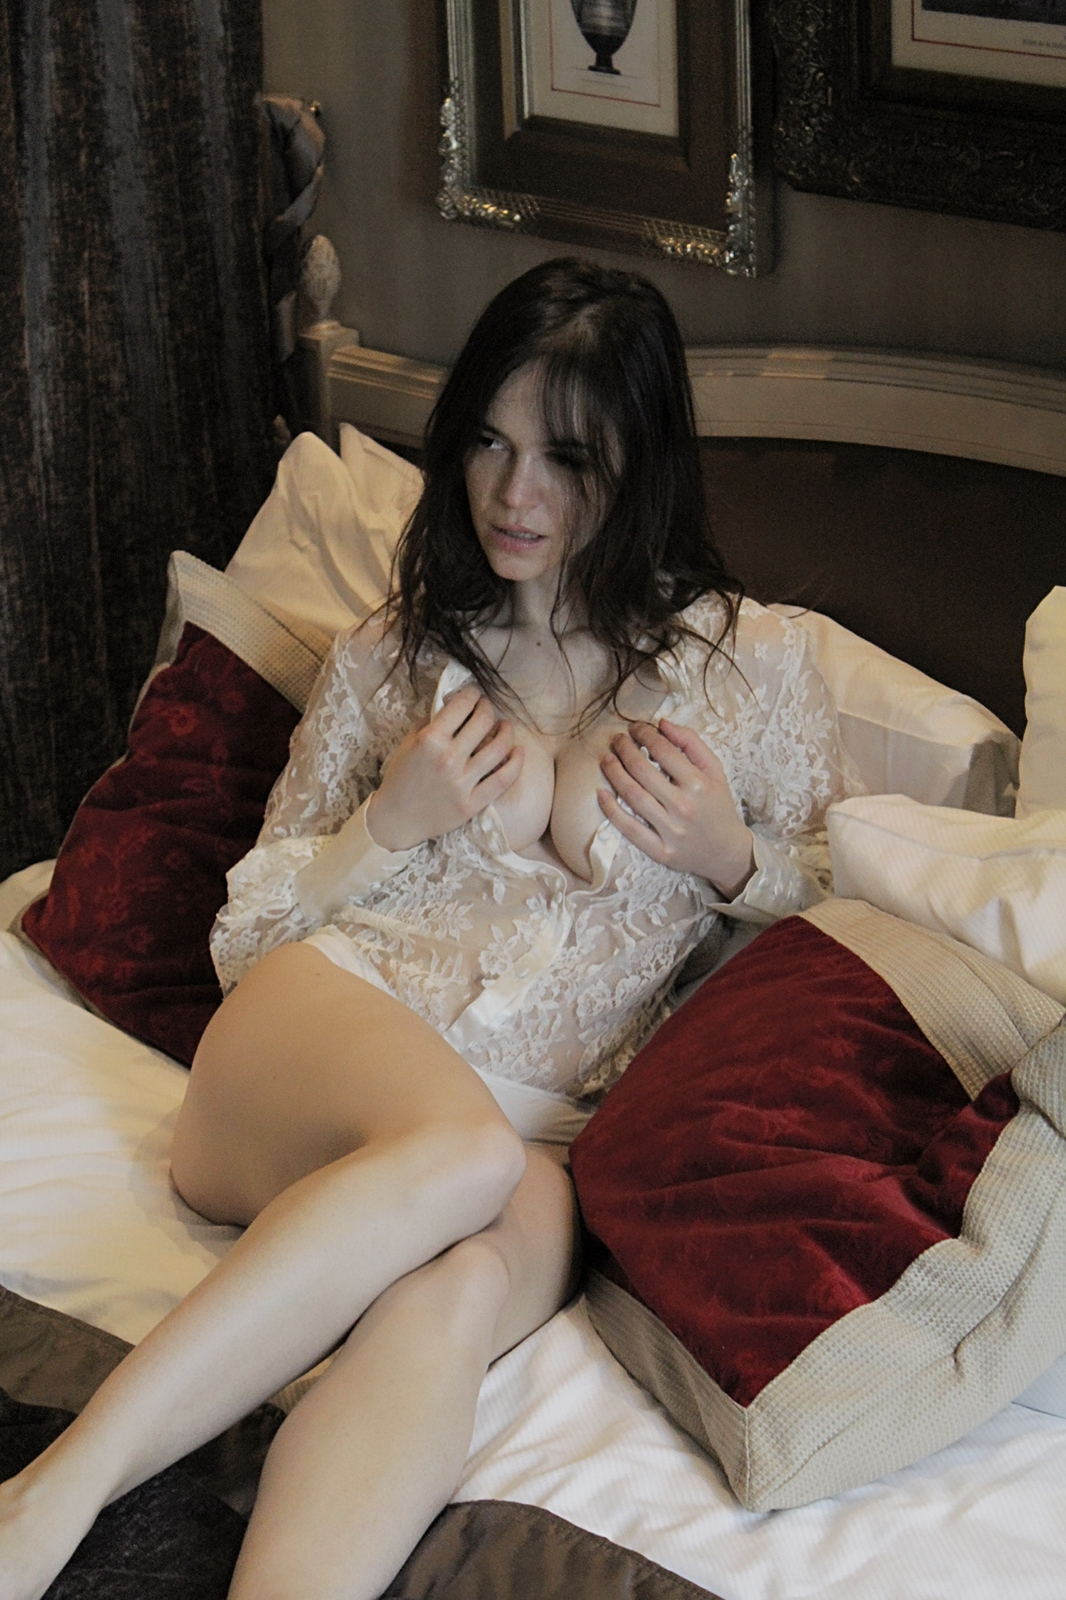 Fanny Women    // lionsmag.com - premium nude photography magazine